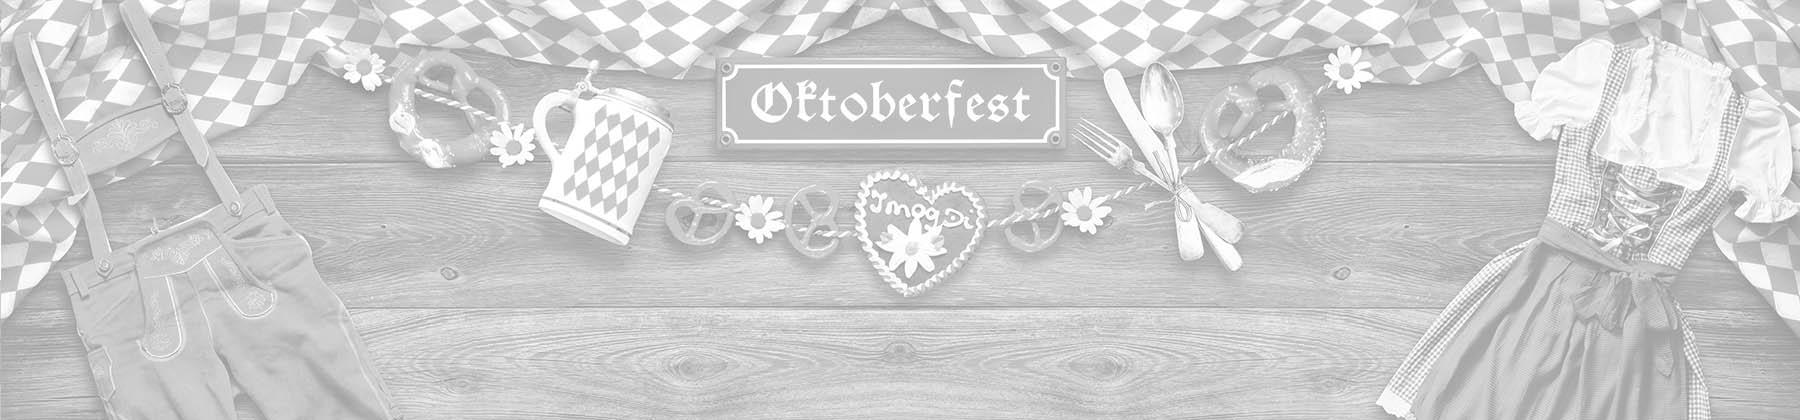 Header-Oktoberfest